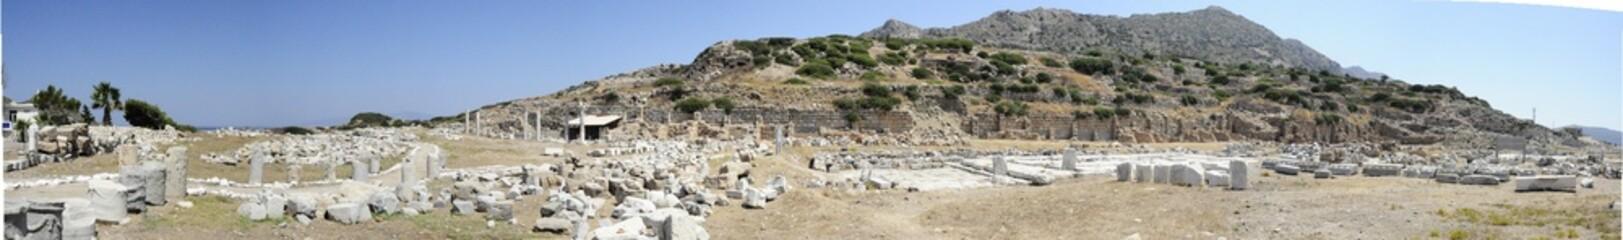 Panoramic Temple of Aphrodite, Knidos, Datca, Mugla, Turkey